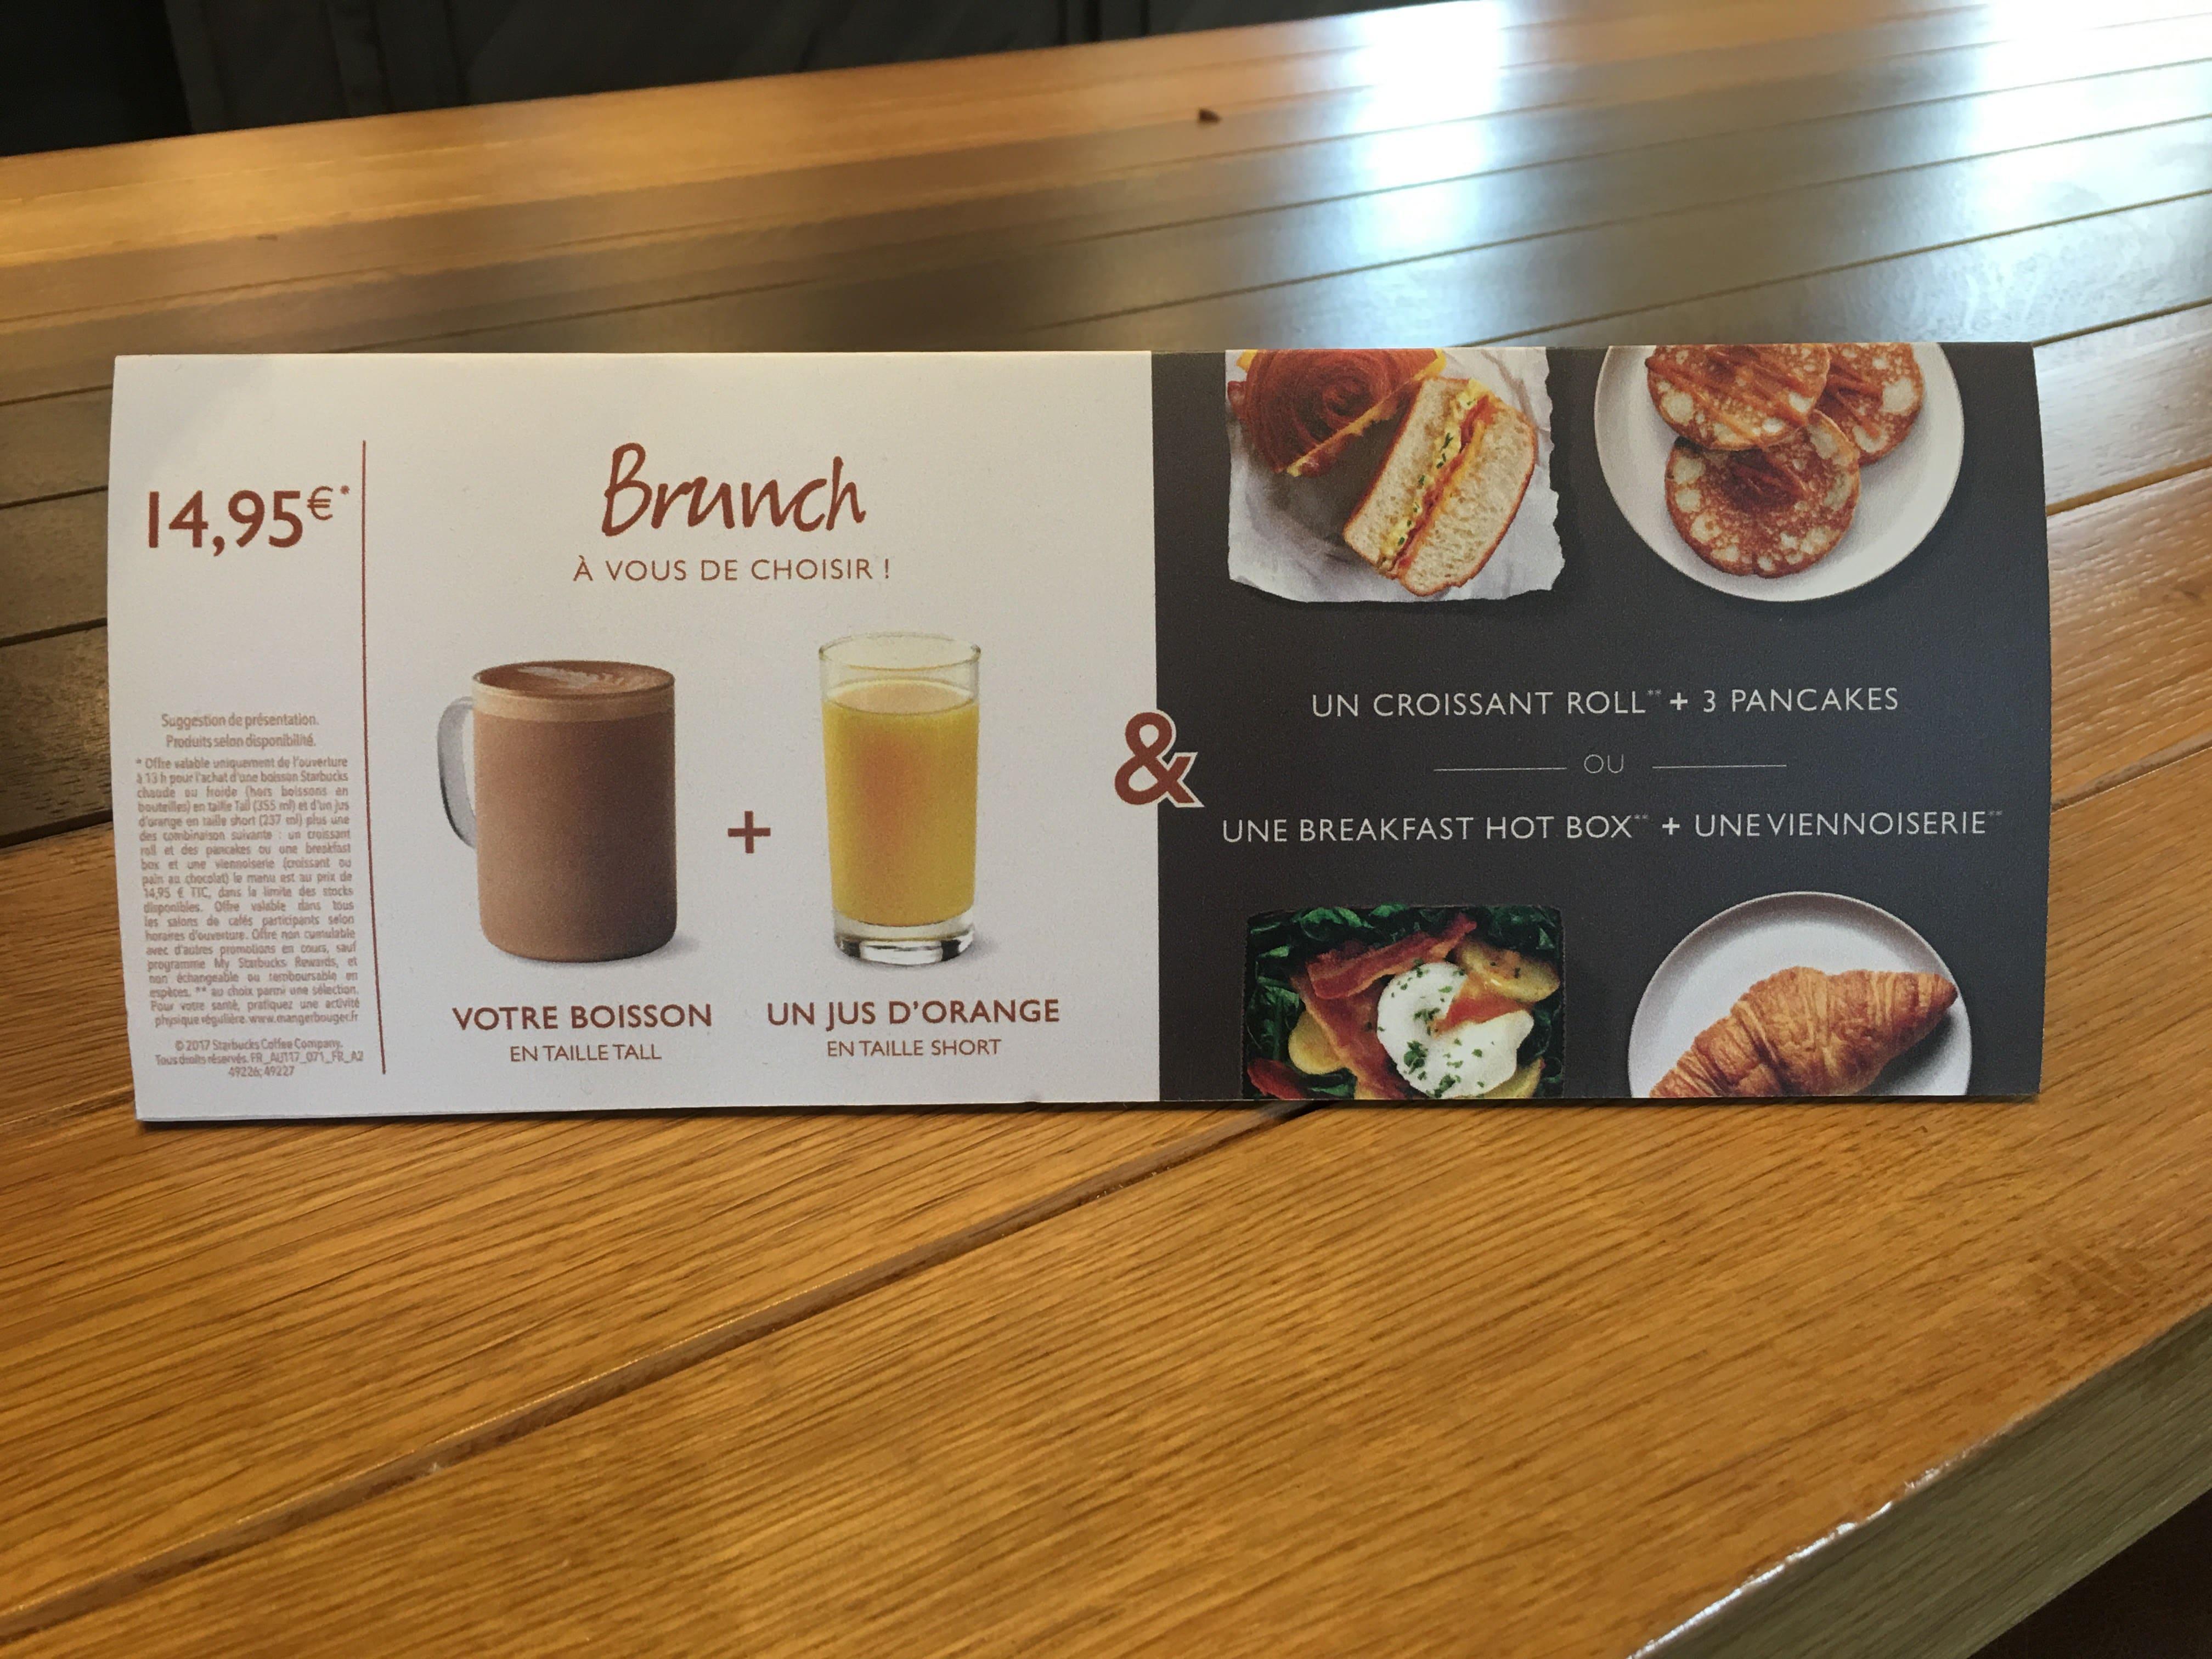 Disneyland Paris - Starbucks Brunch Menu